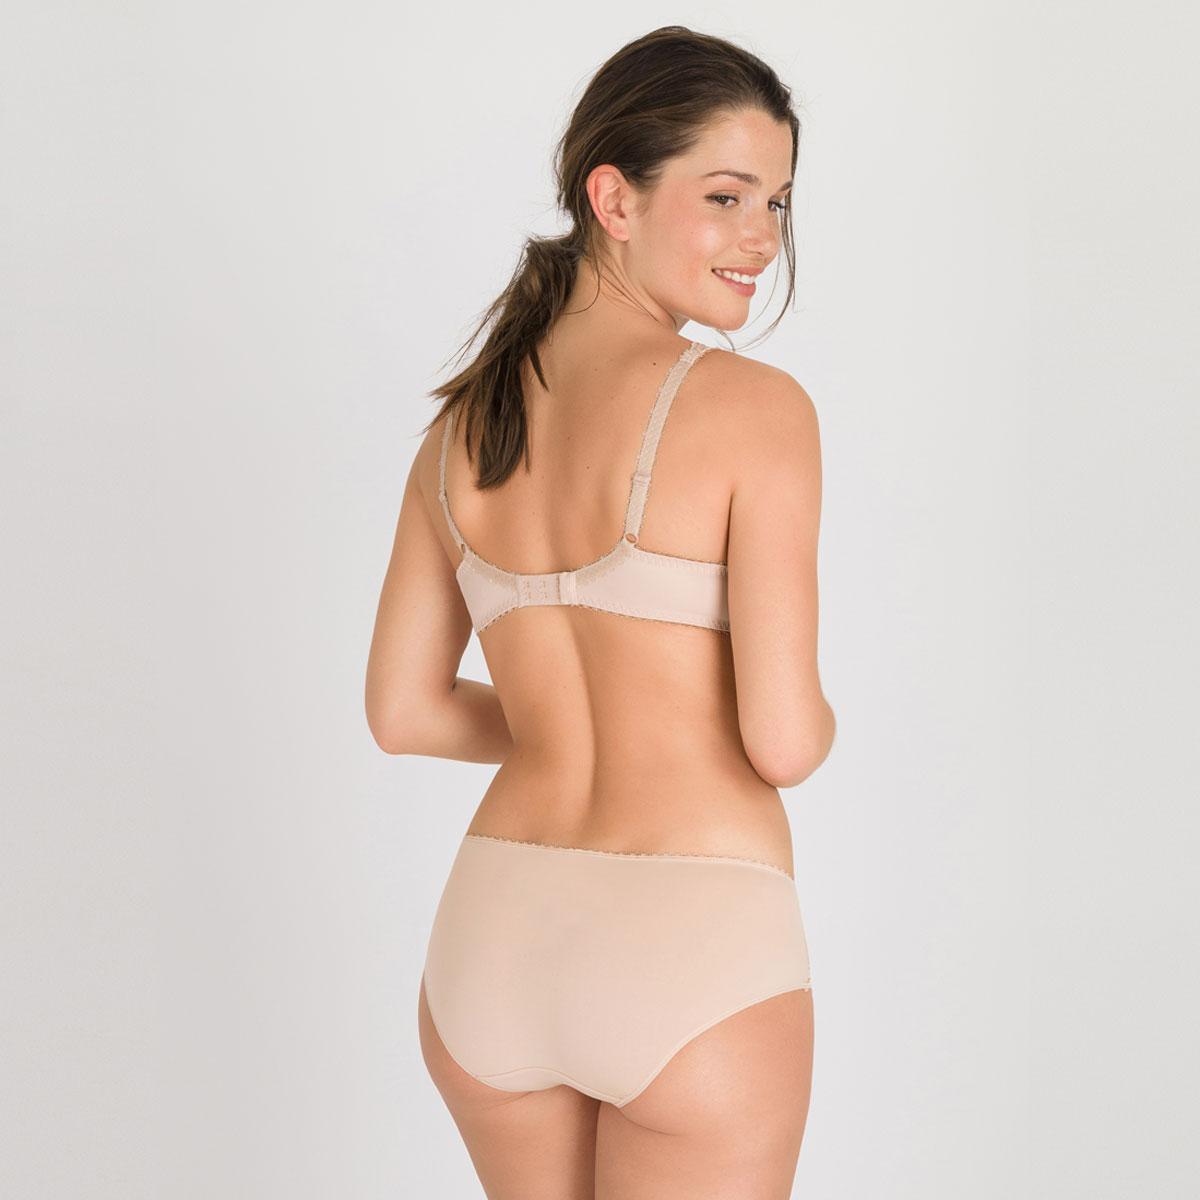 Soutien-gorge paddé beige – Flower Elegance-PLAYTEX